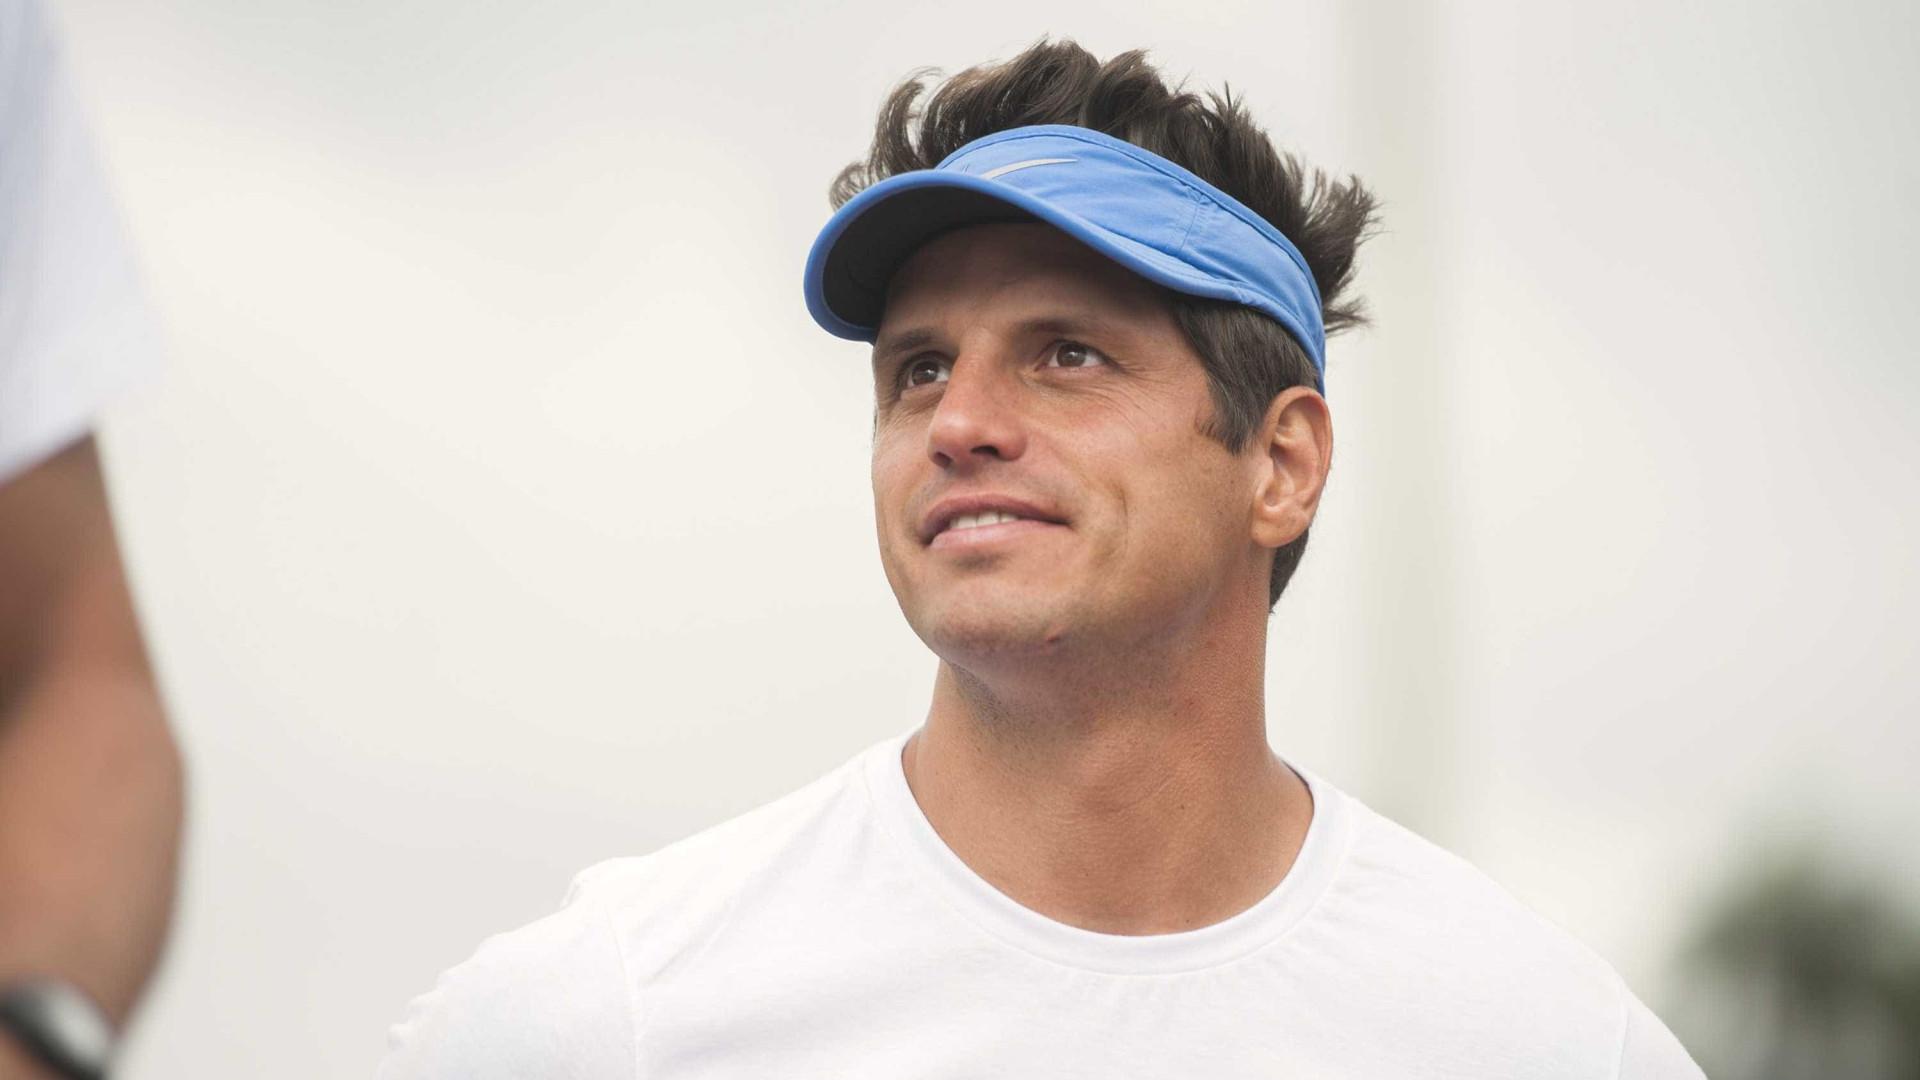 Ex-BBB e atleta paralímpico Fernando Fernandes terá cinebiografia